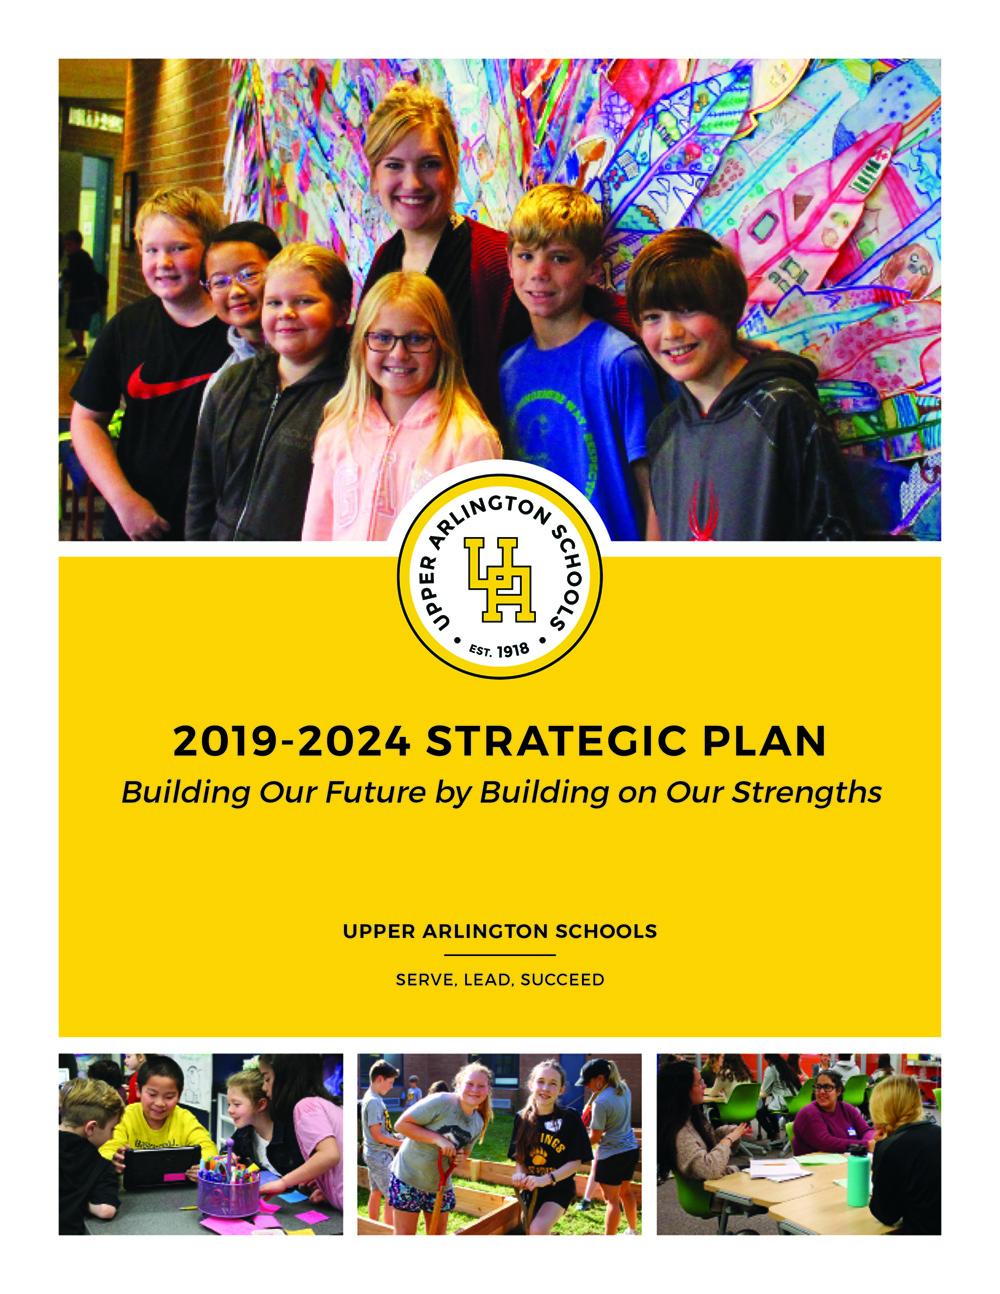 2019-2024 Strategic Plan (PDF)